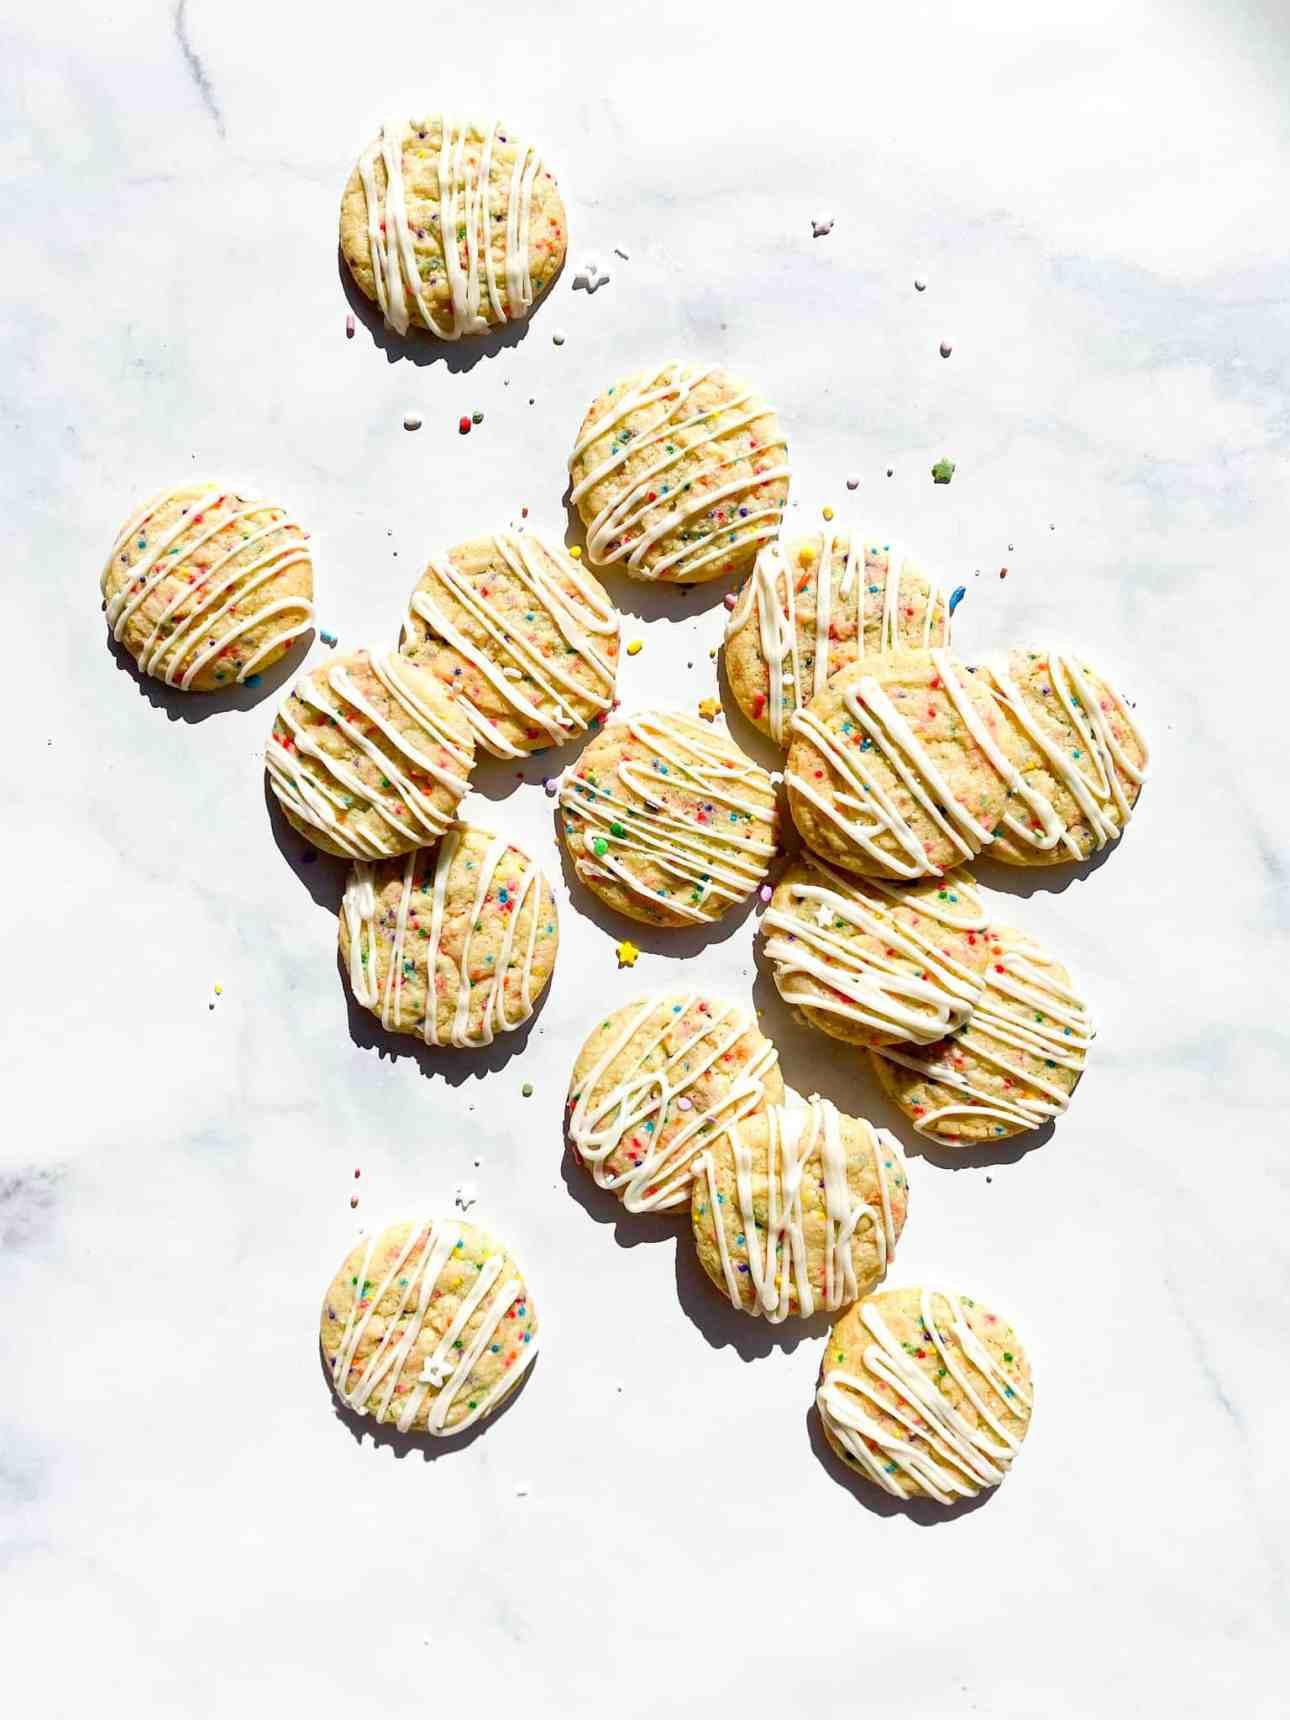 Birthday Cake Cookies with Vanilla Drizzle